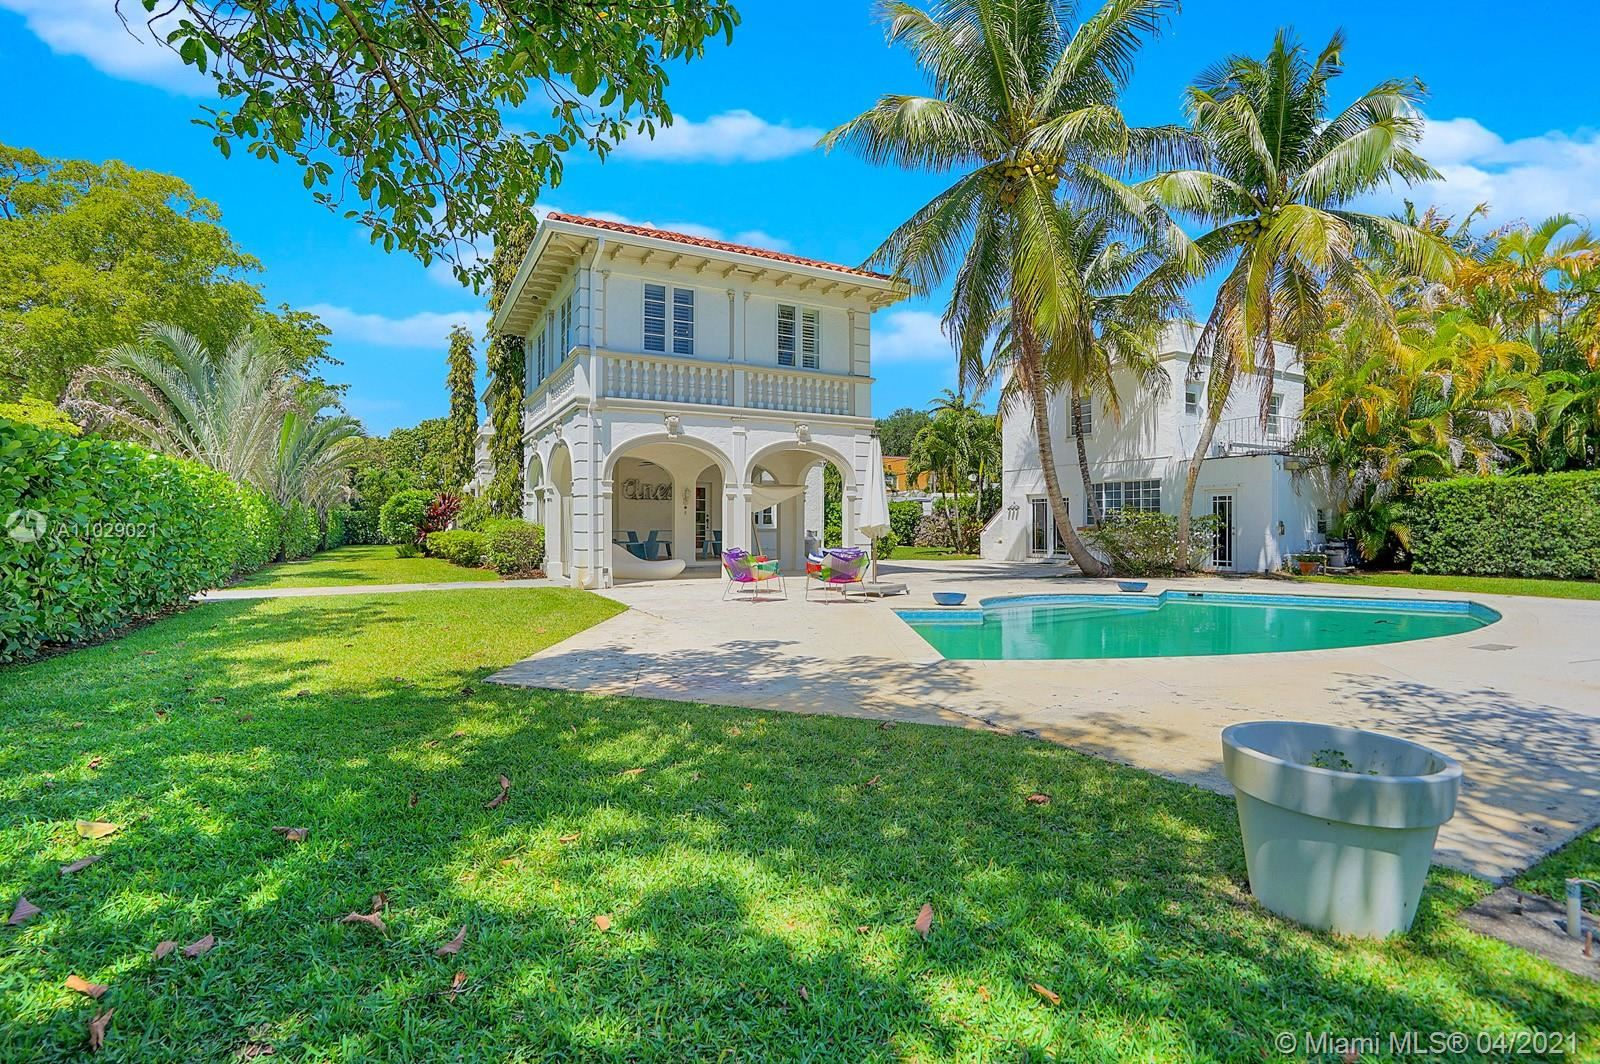 Photo of 1217 Granada Blvd, Coral Gables, FL 33134 (MLS # A11029021)